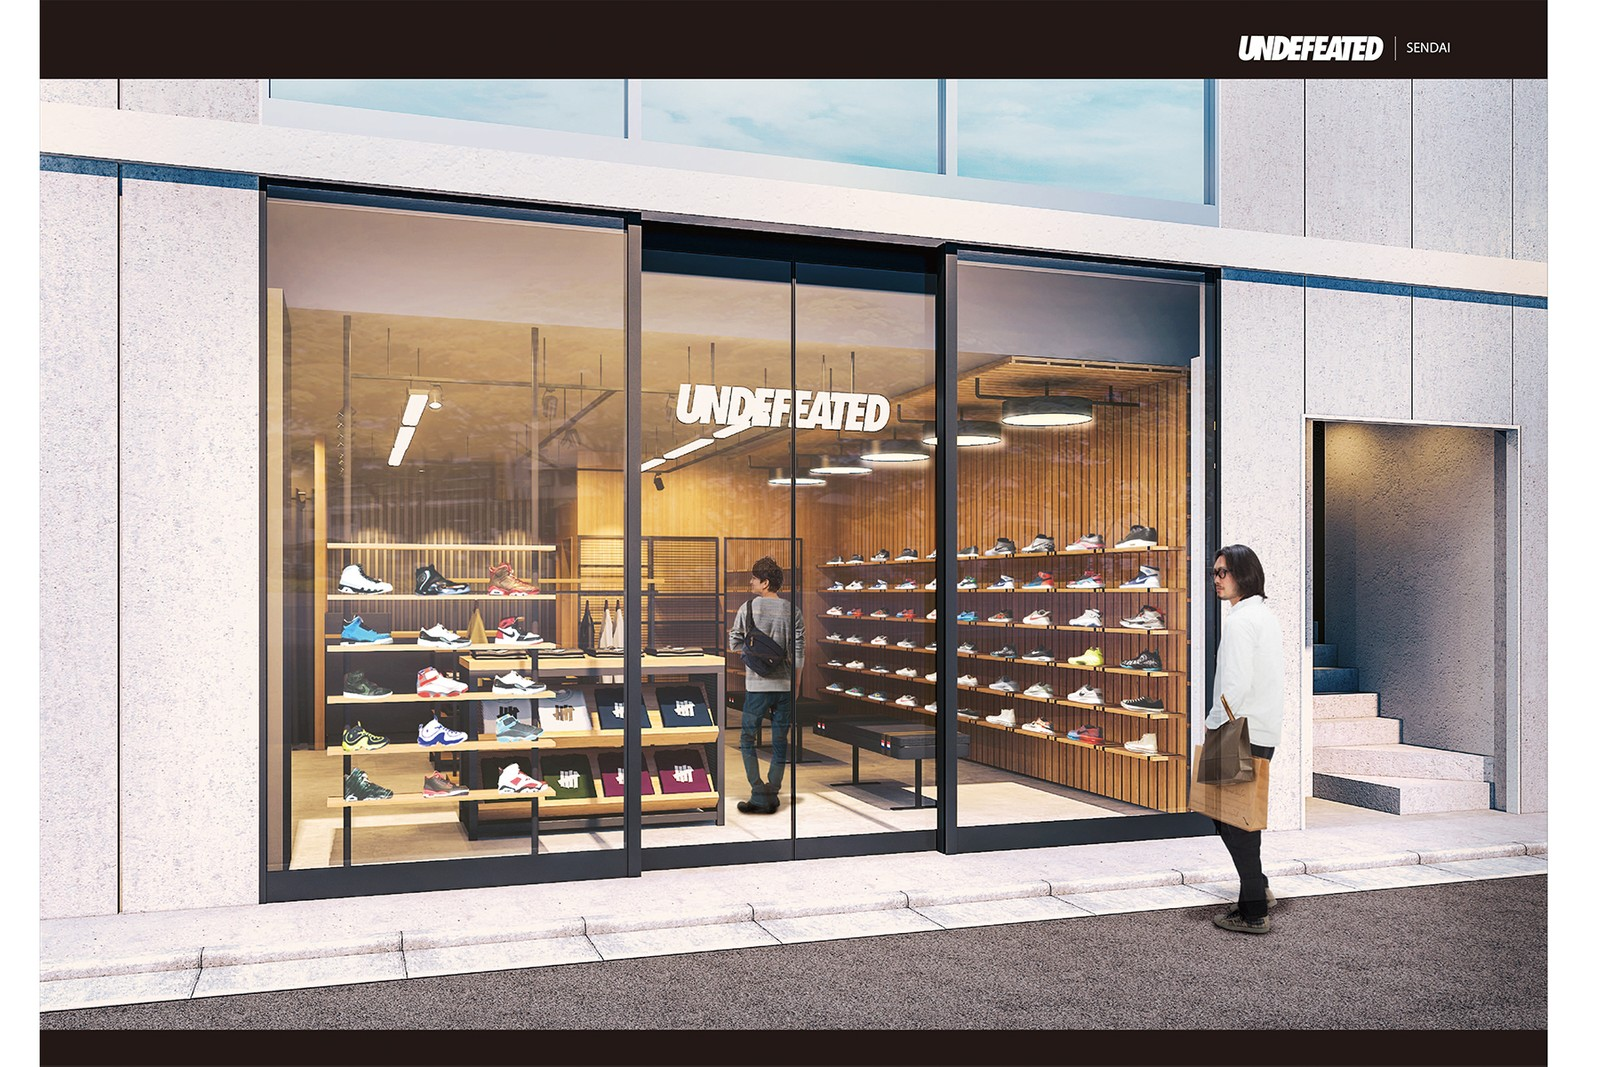 UNDEFEATED アンディフィーテッド sendai 宮城県 仙台 新店舗 オープン